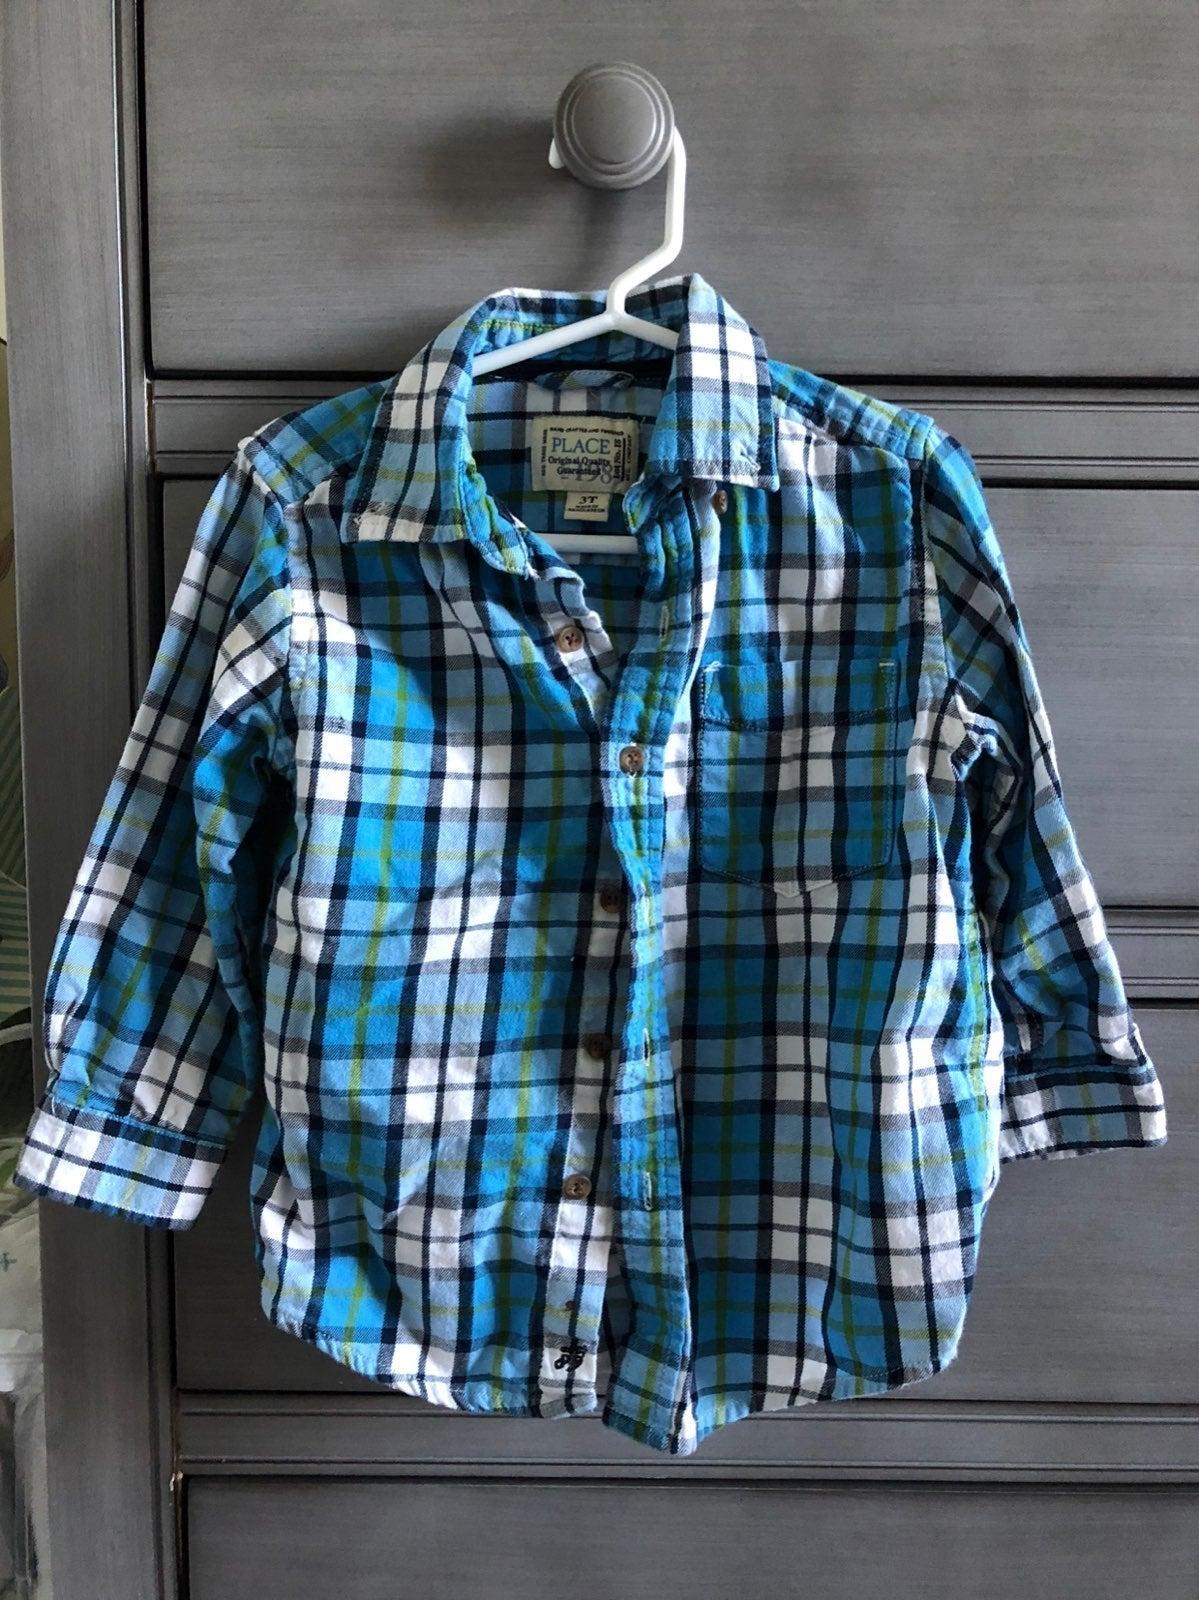 Childrens Place Boys 3T Shirt